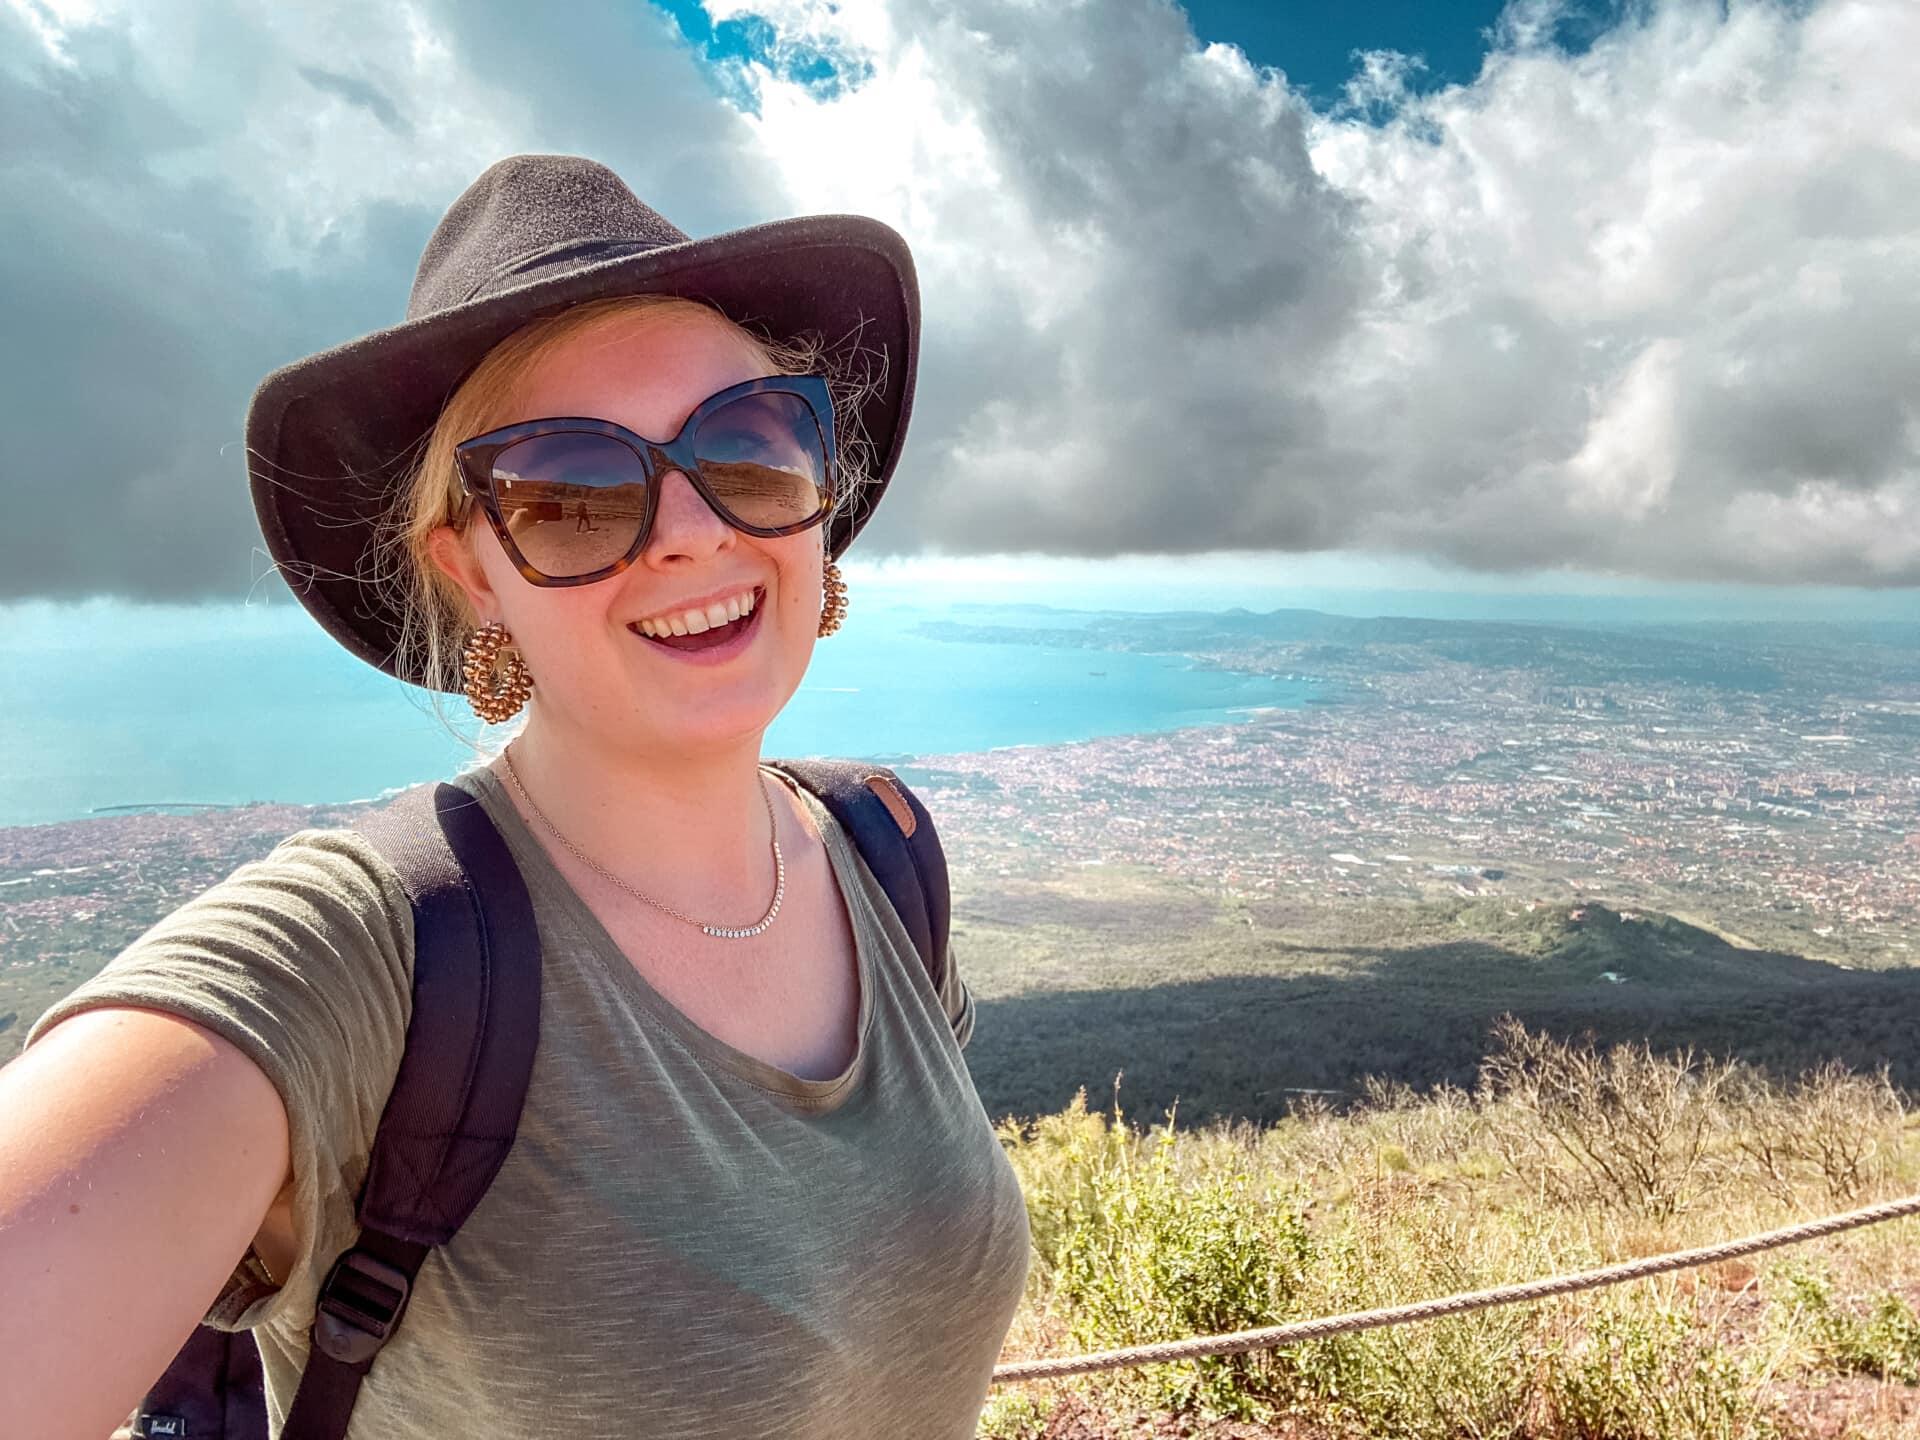 MaandoverzichtSep2020 3 - Explorista maandoverzicht 36: Italië | September 2020